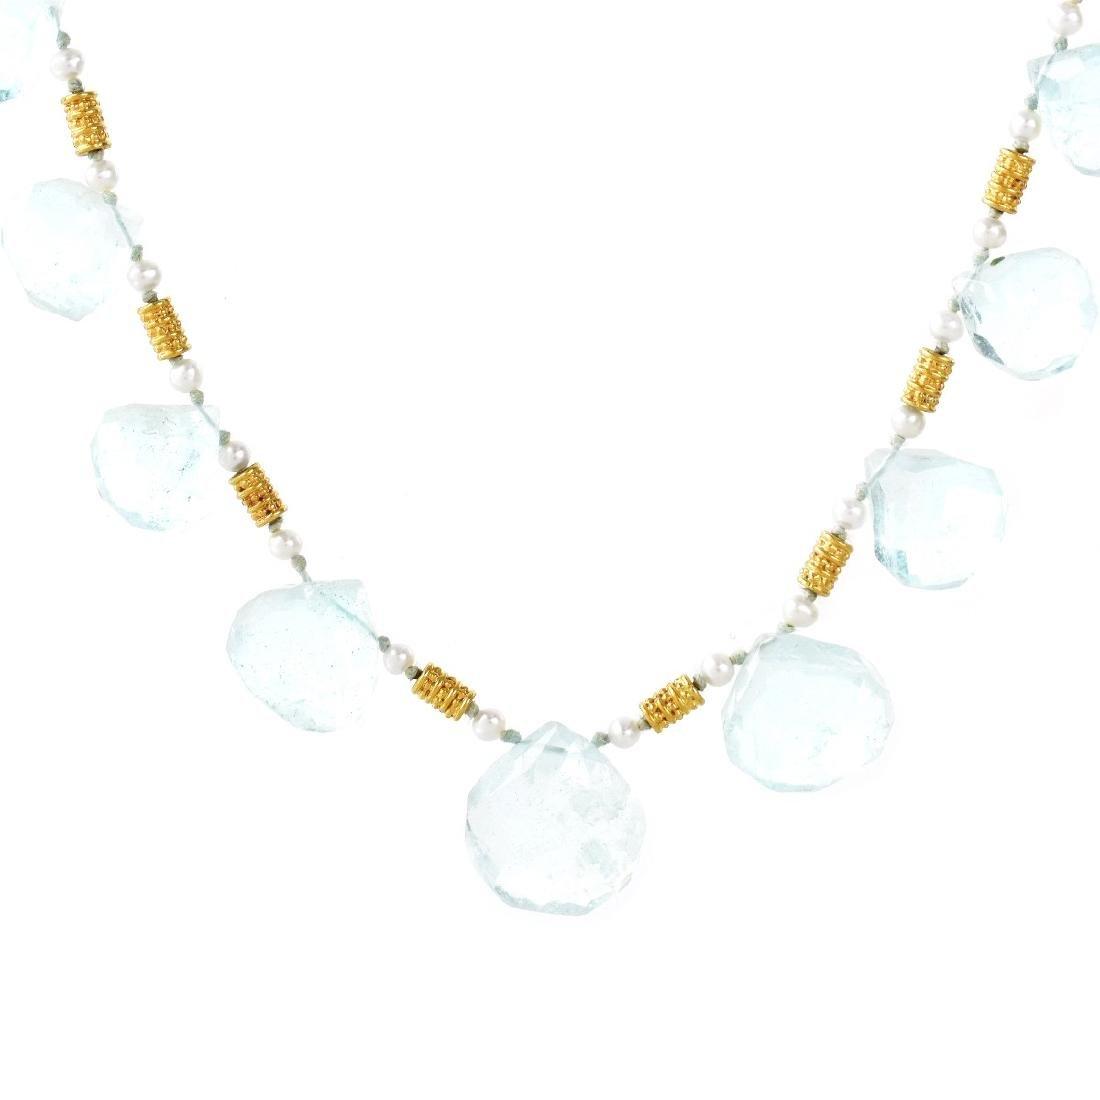 Aquamarine and 22K Gold Necklace